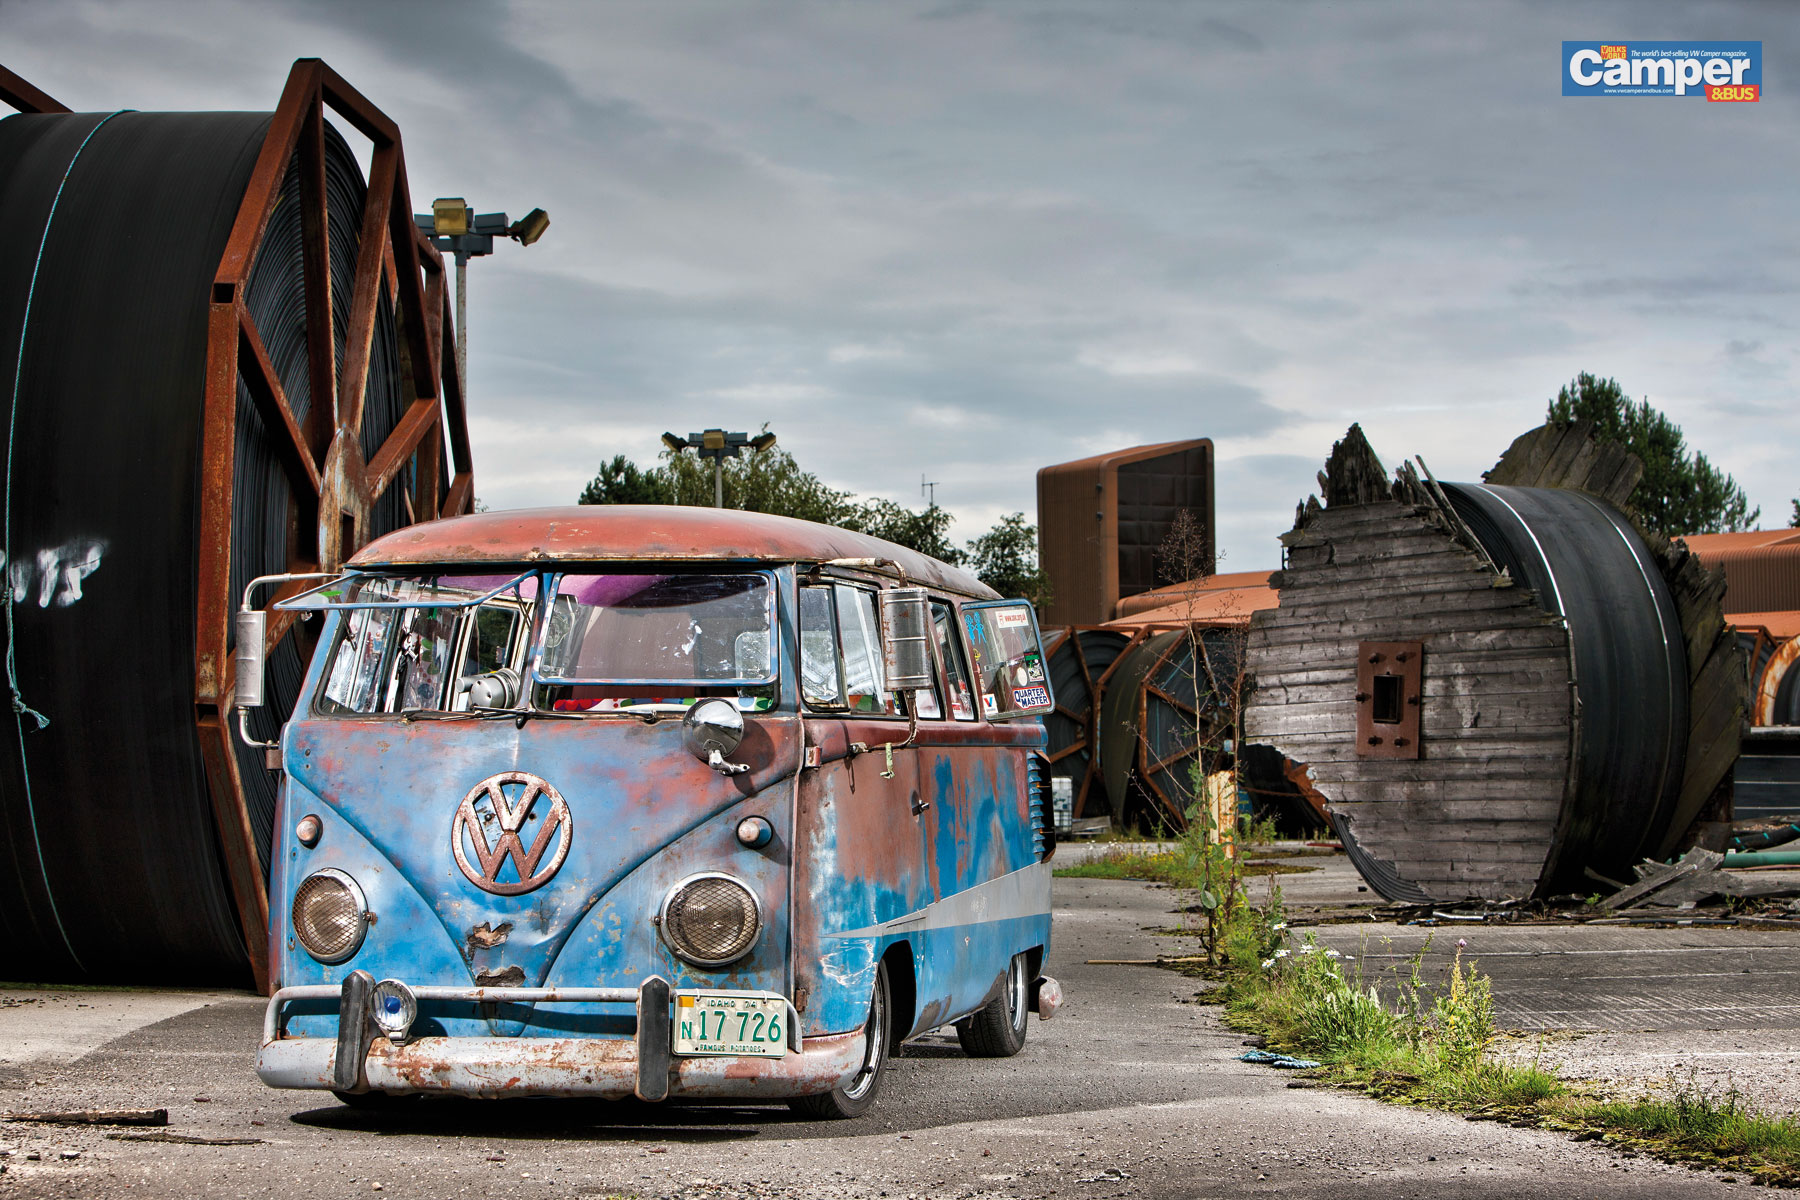 78 Vw Bus Wallpaper On Wallpapersafari